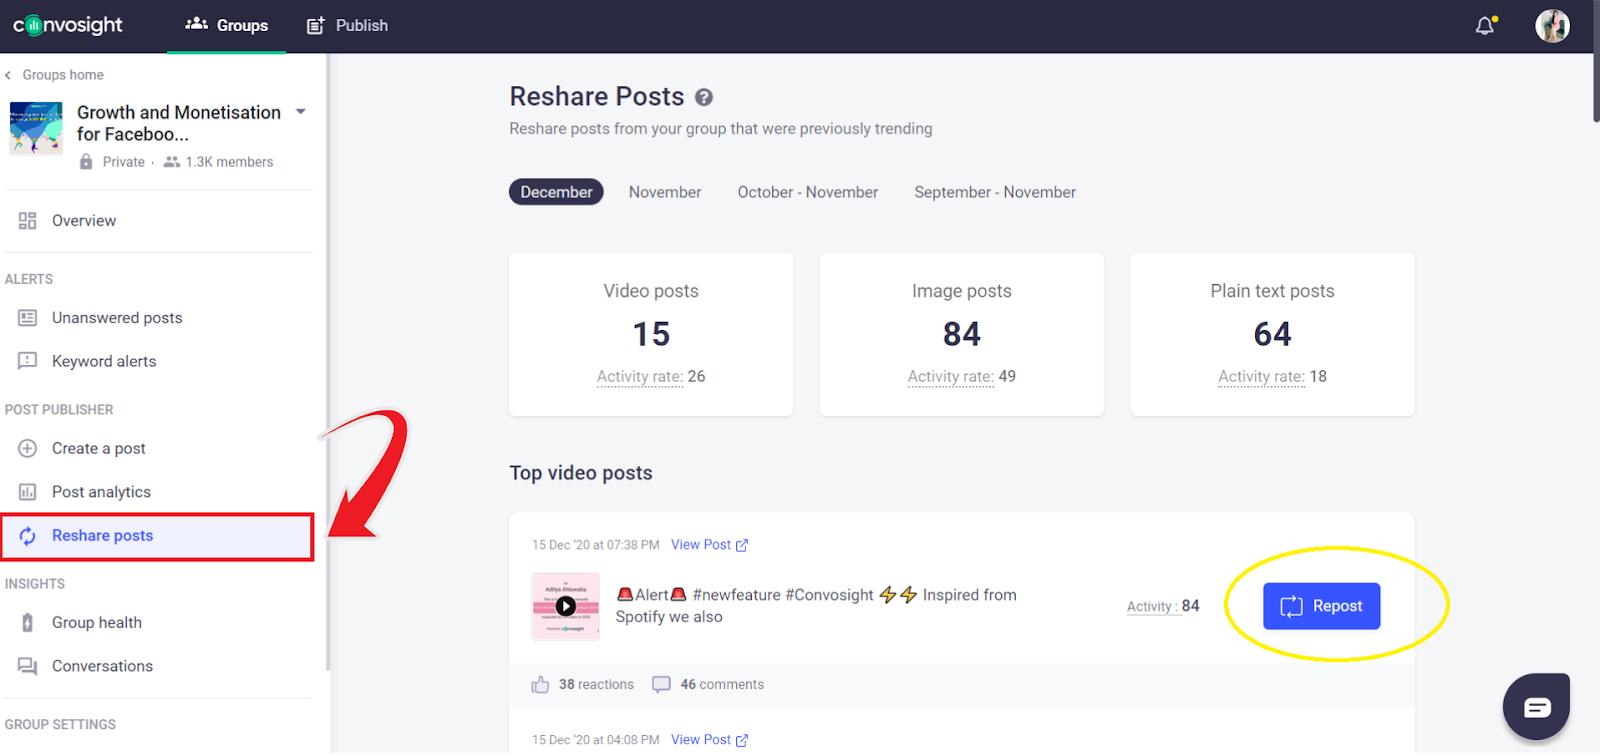 reshare posts new